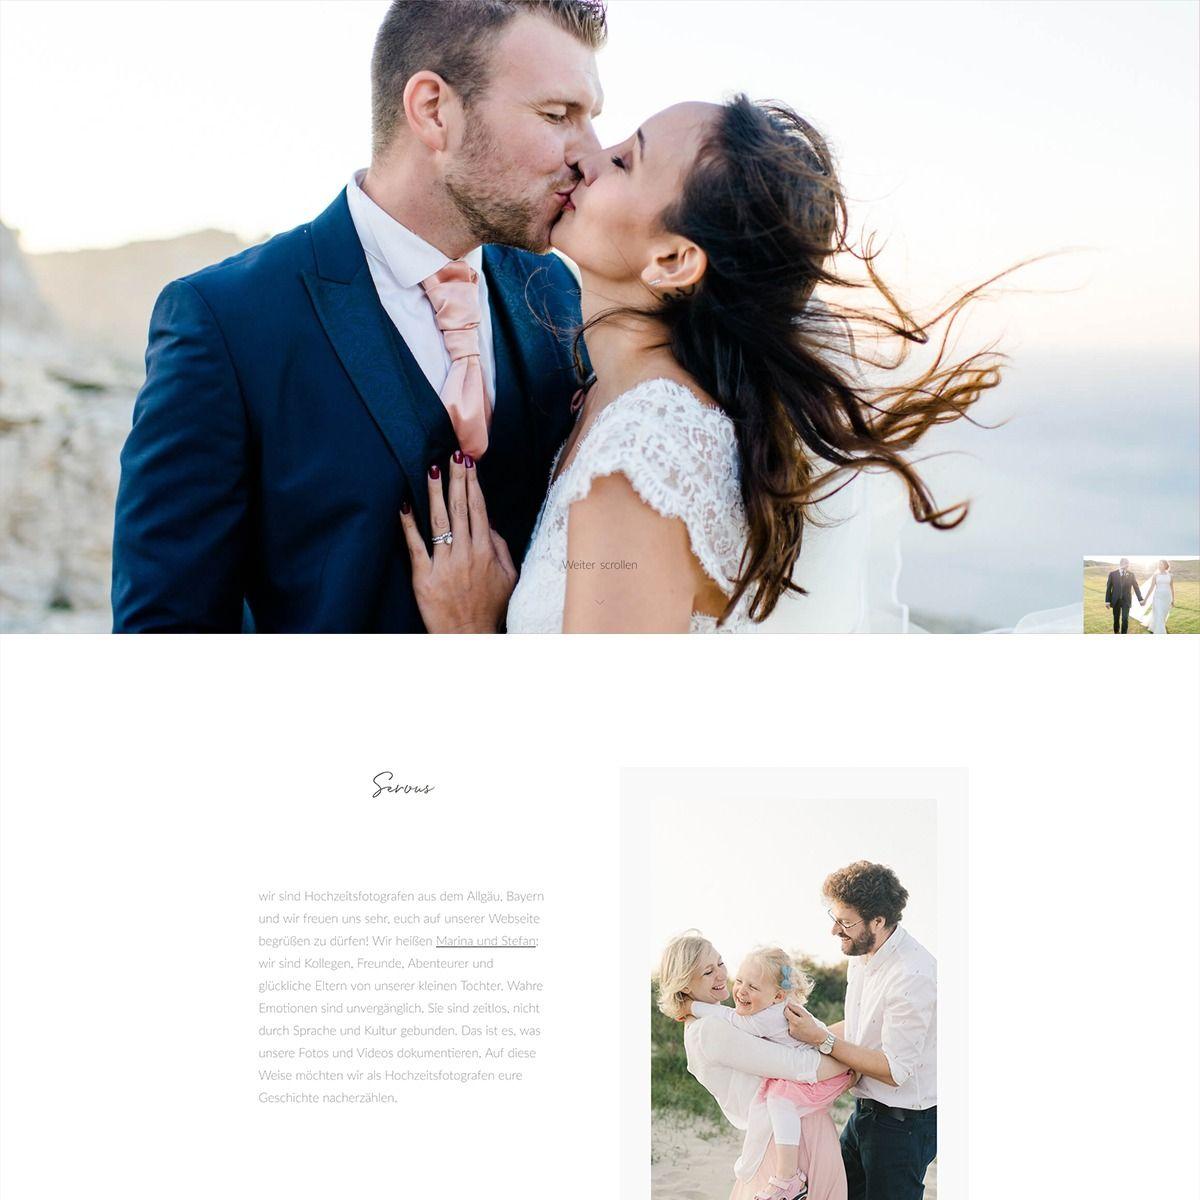 Crowd Ii Flothemes Wedding Photography Website Design Wedding Photography Website Photography Website Design